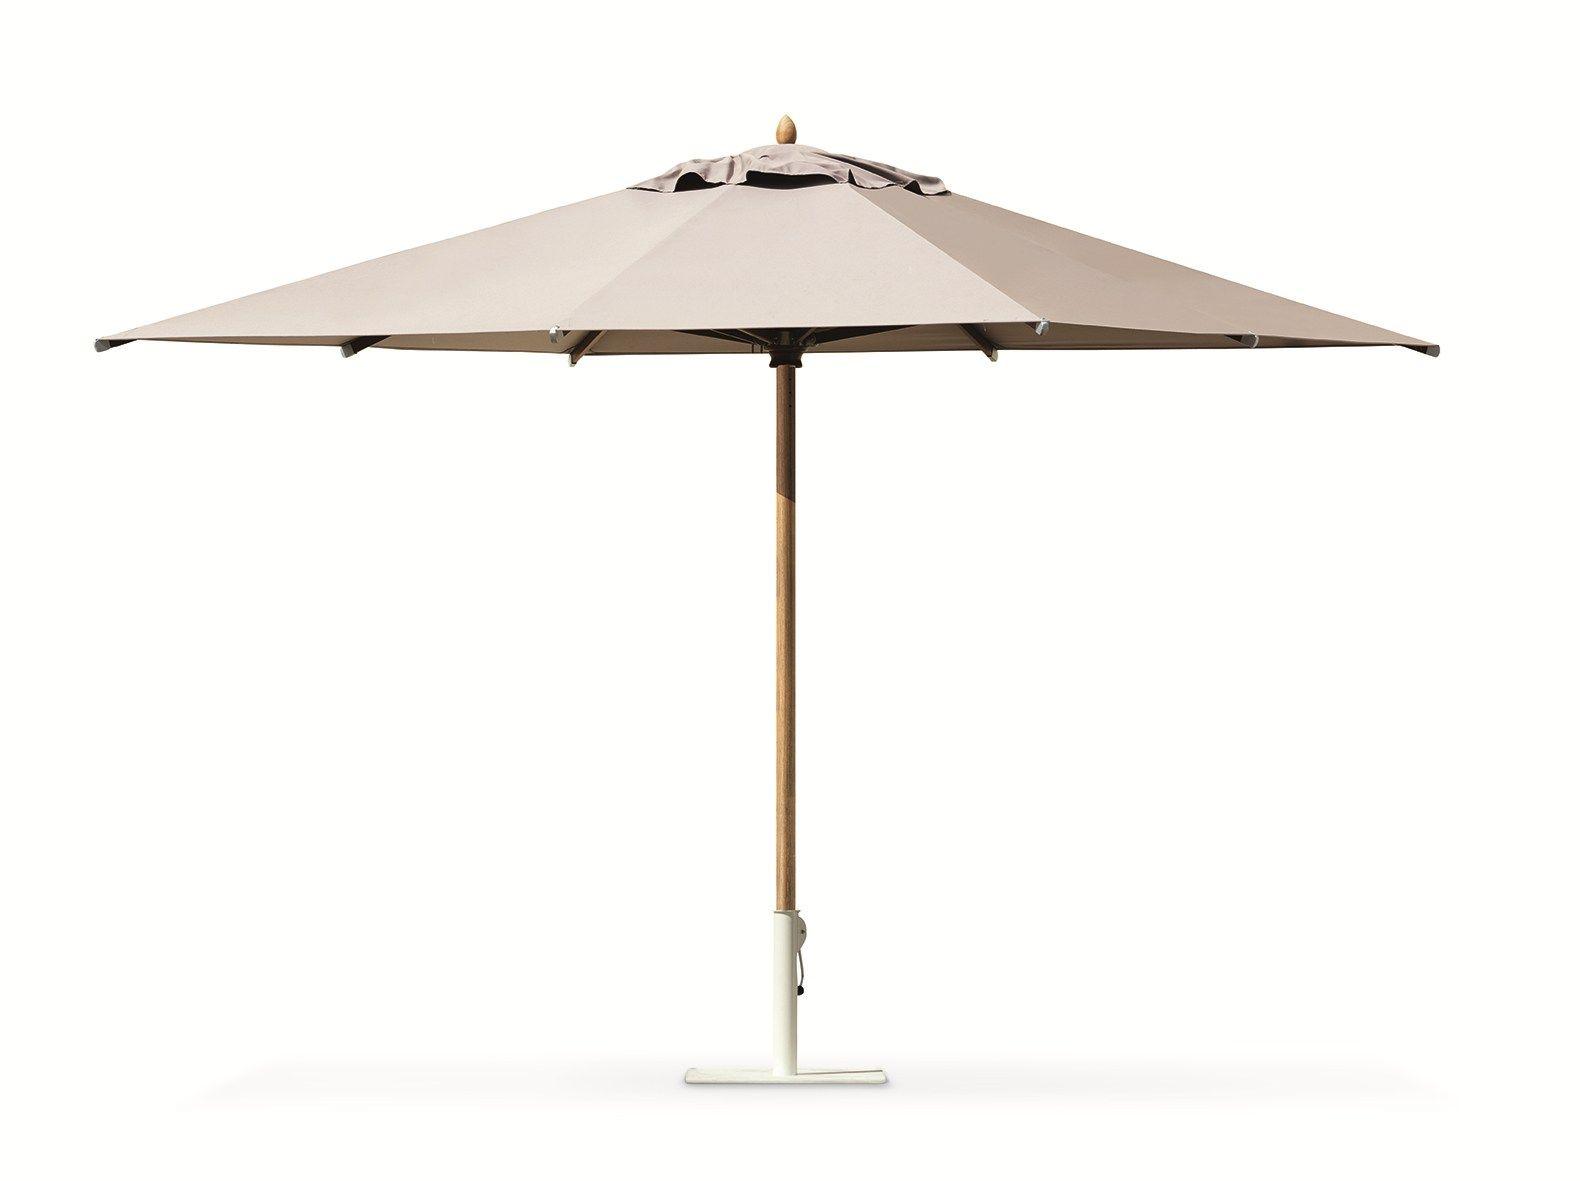 CLASSIC Square Garden umbrella By Ethimo